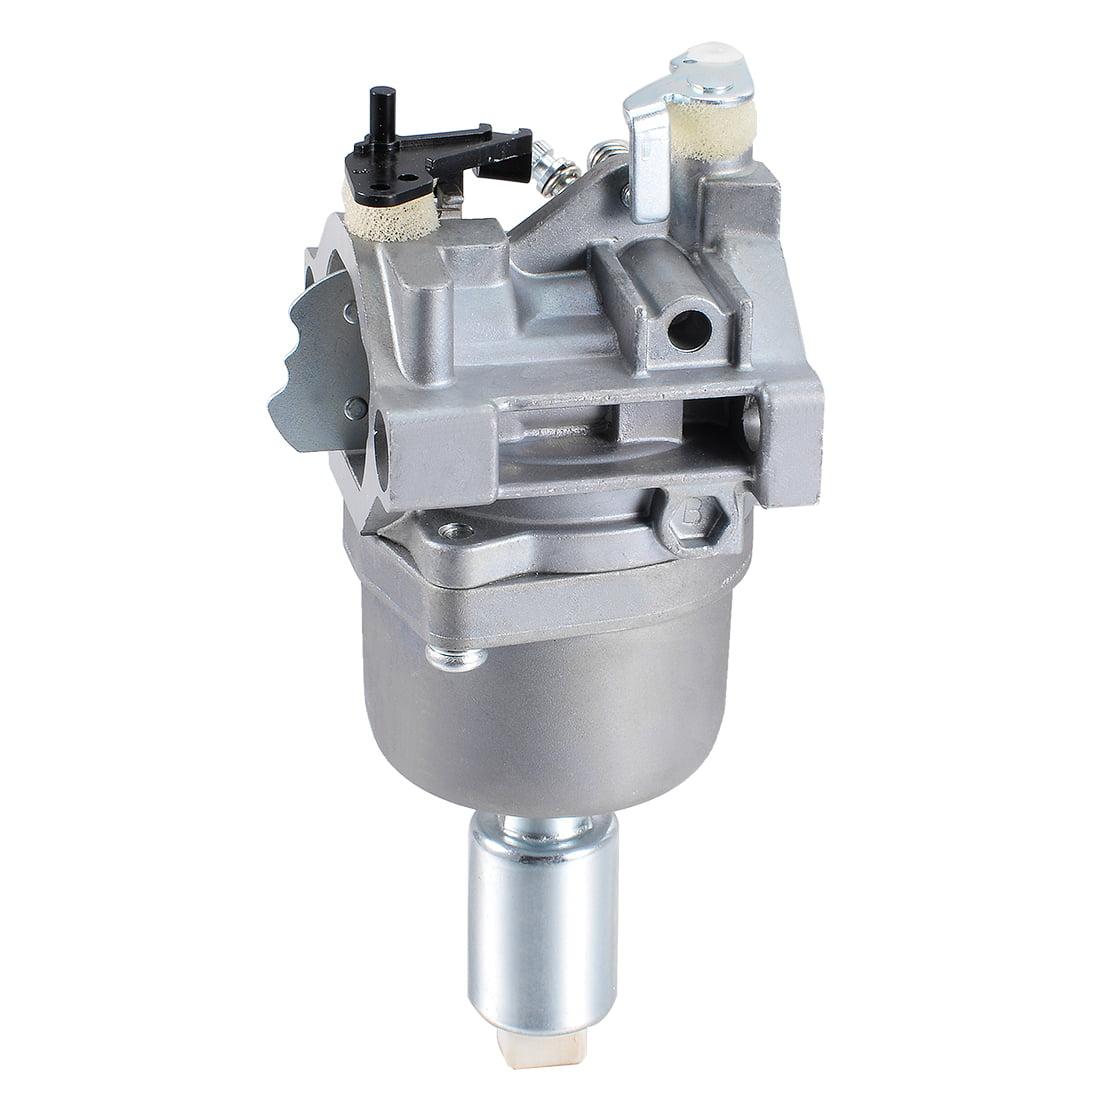 Unique Bargains Carburetor Kit Replaces Briggs & Stratton 794572 791858 792358 Intek 14HP 18HP - image 5 of 7